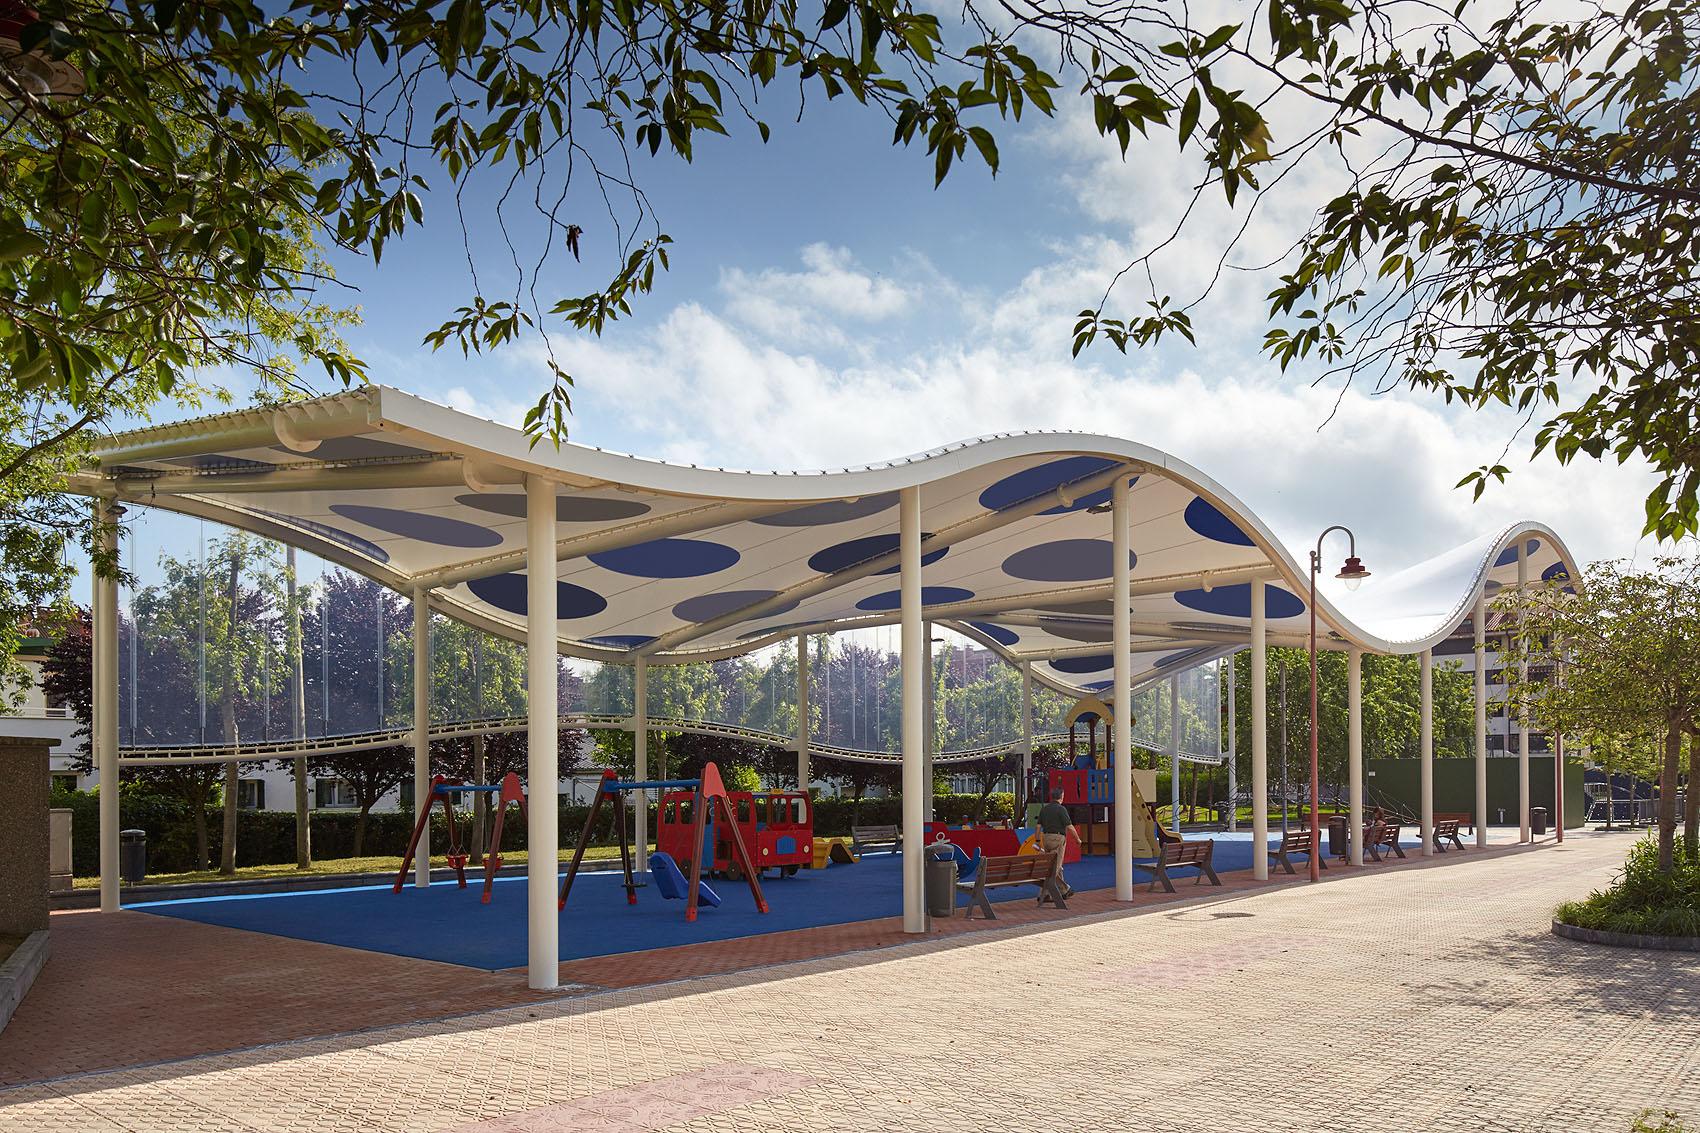 Parque Igerain Gain - Iñaki Caperochipi - Fotografía